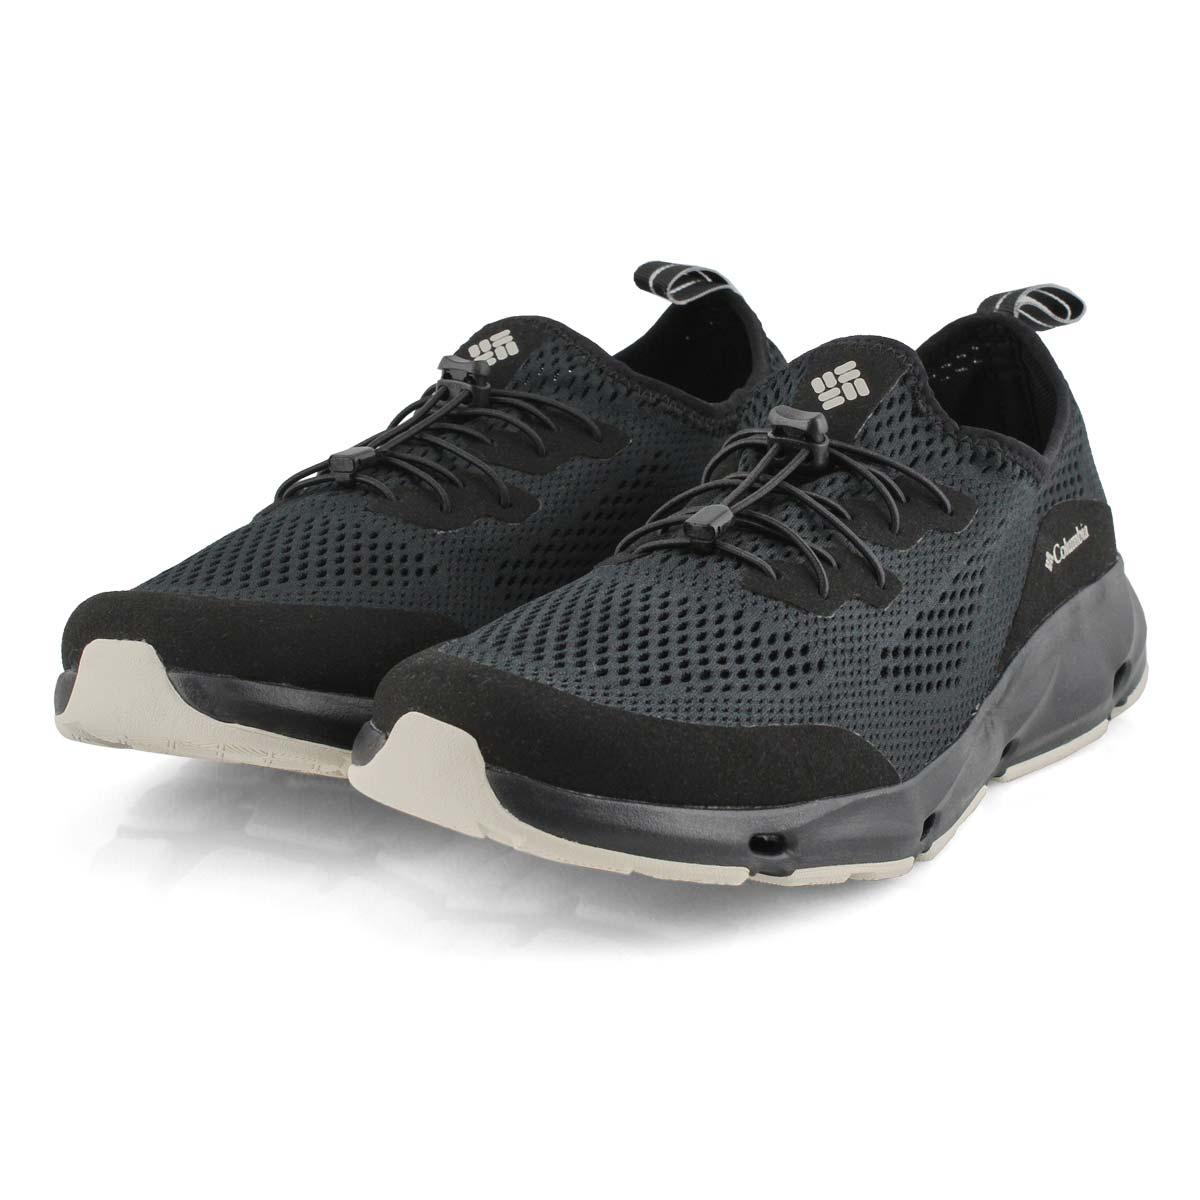 Men's Columbia Vent Sneaker - Black